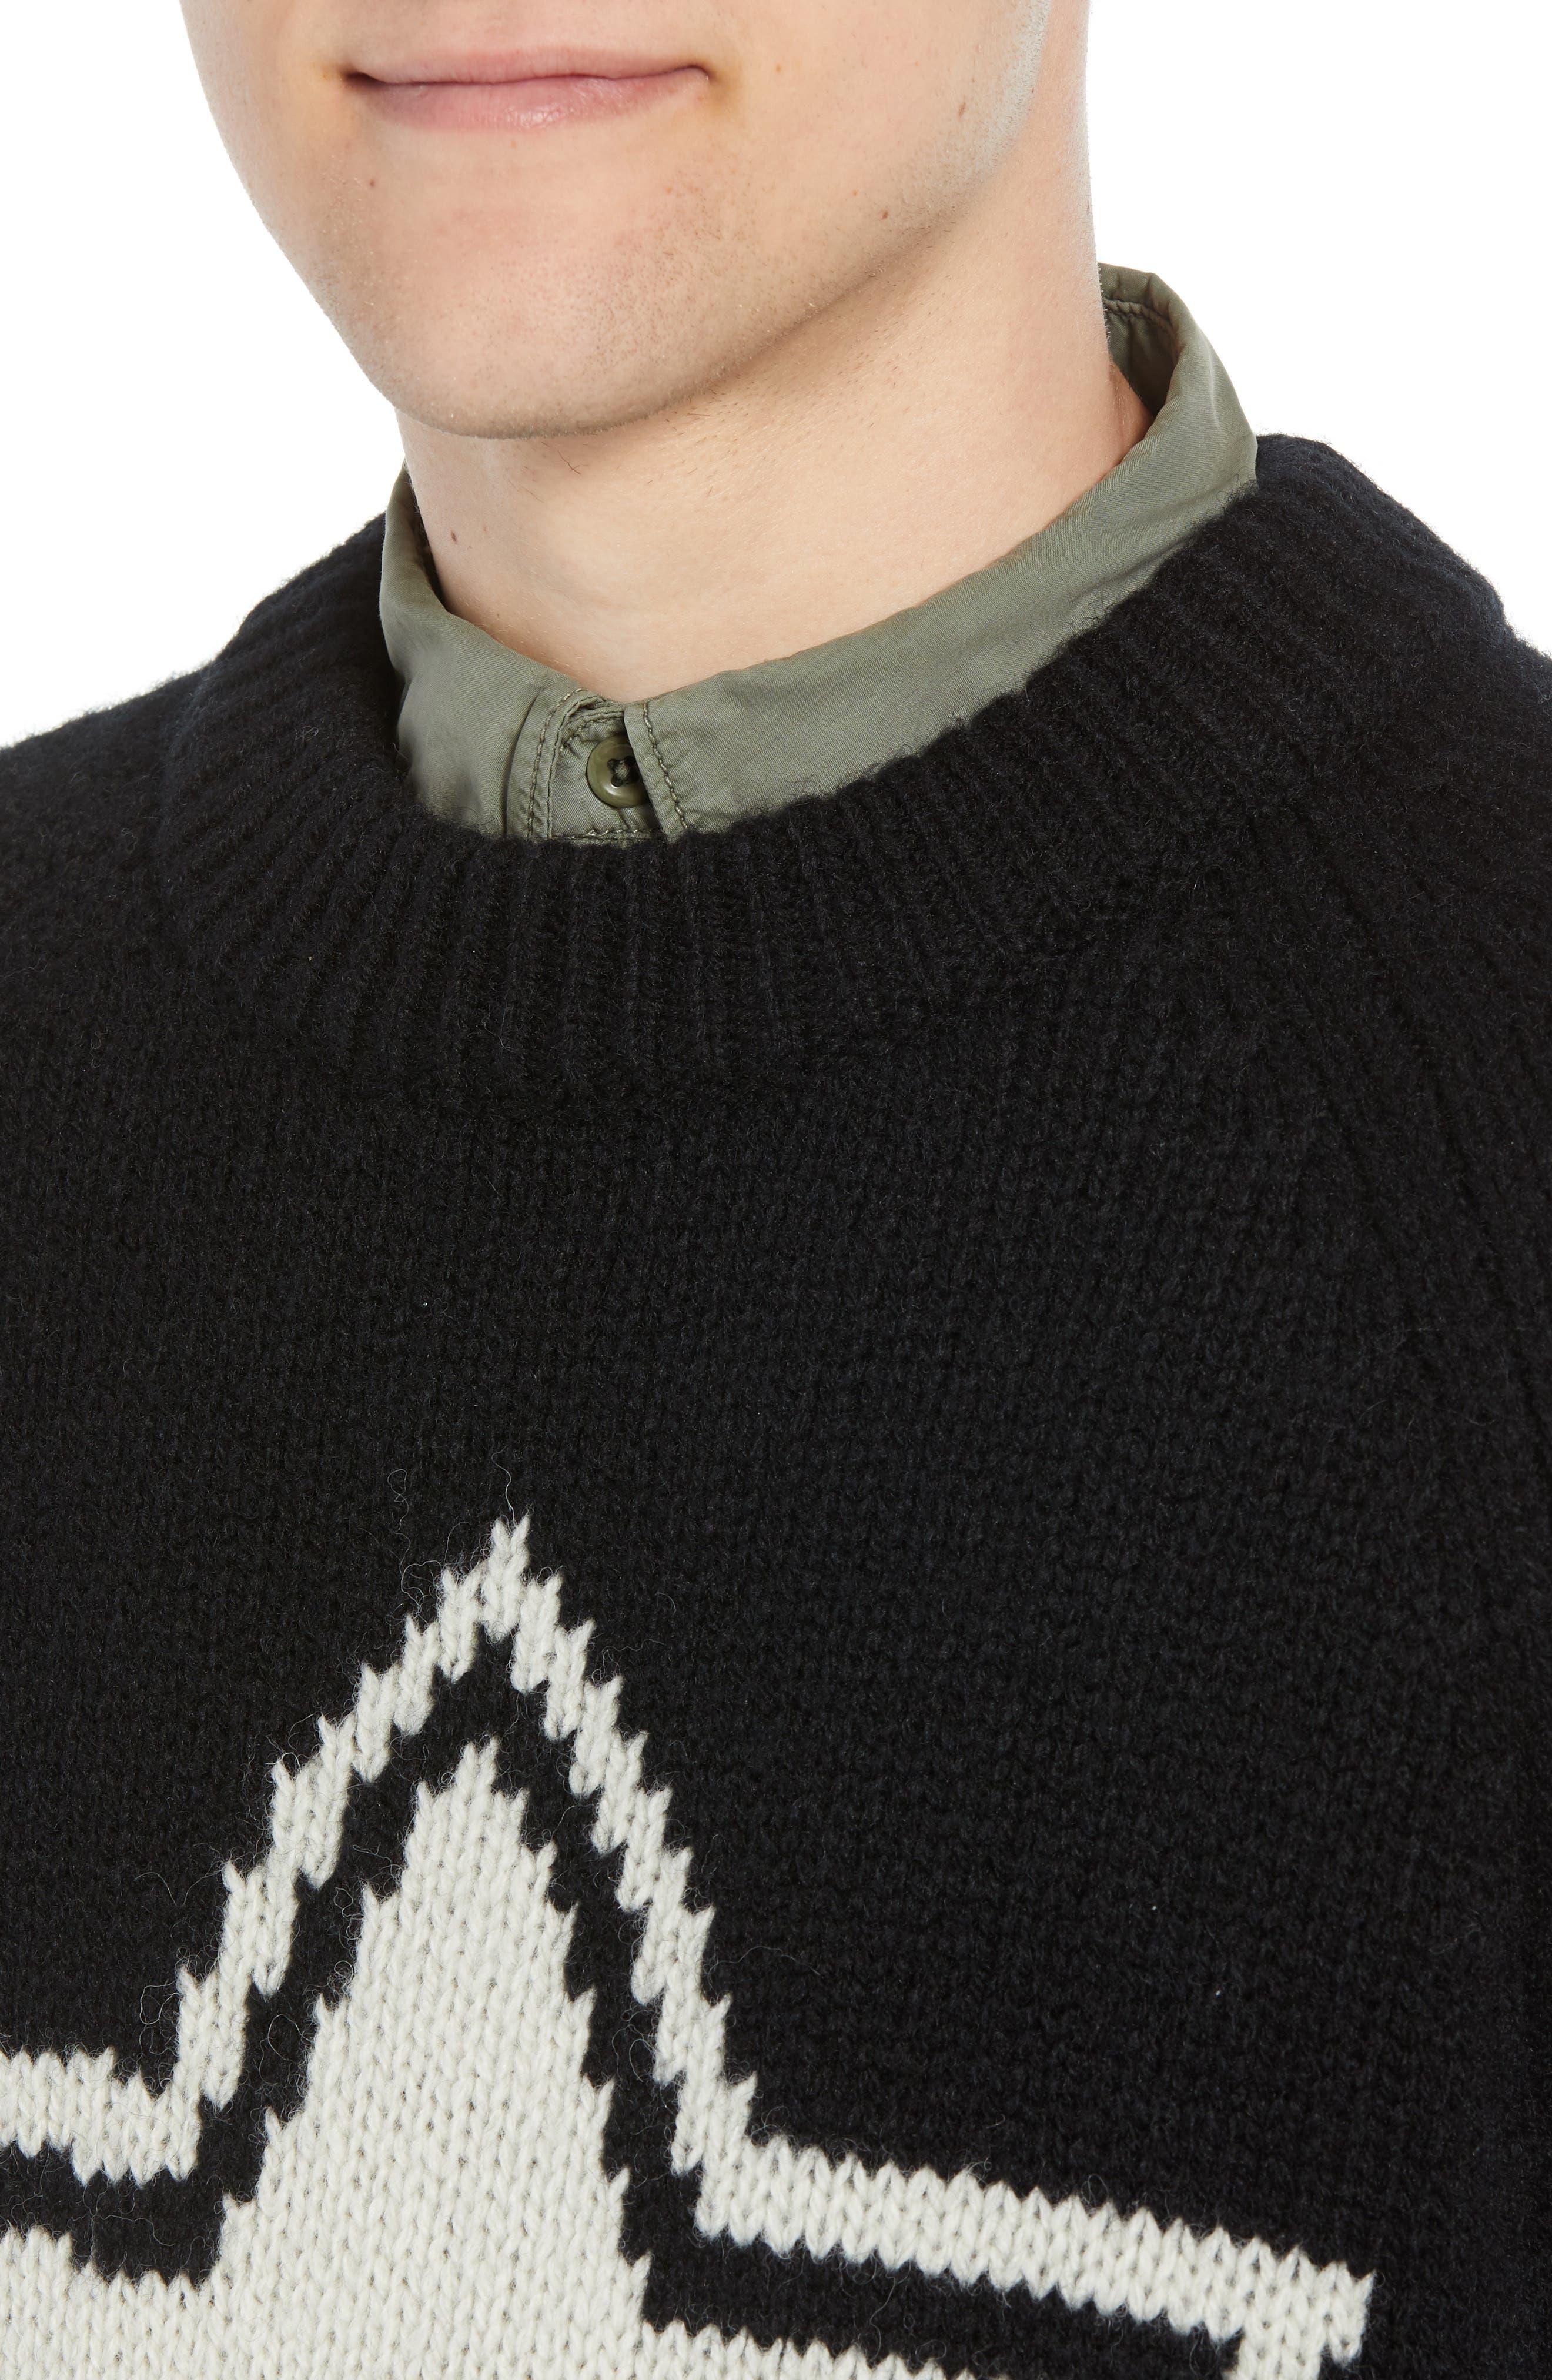 Star Wool Sweater,                             Alternate thumbnail 4, color,                             BLACK WHITECAP GREY